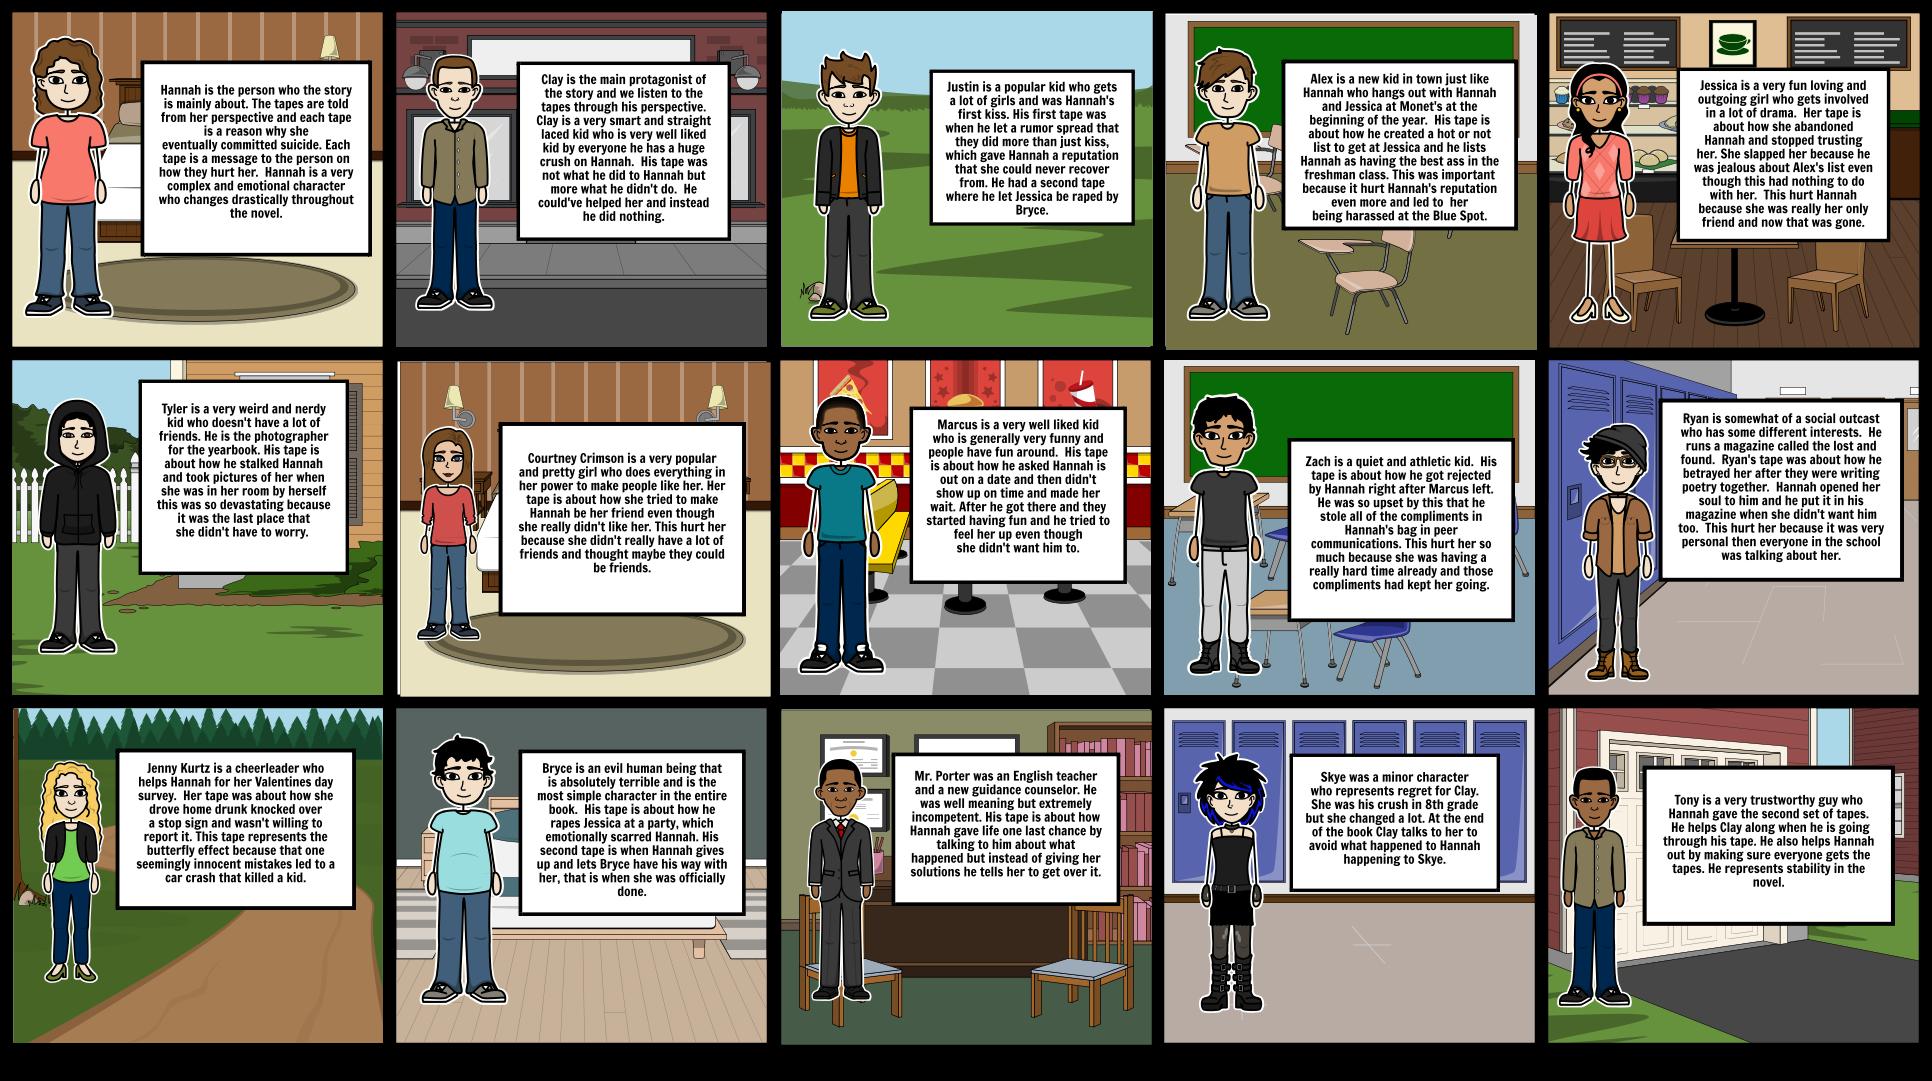 13 reasons why character analysis